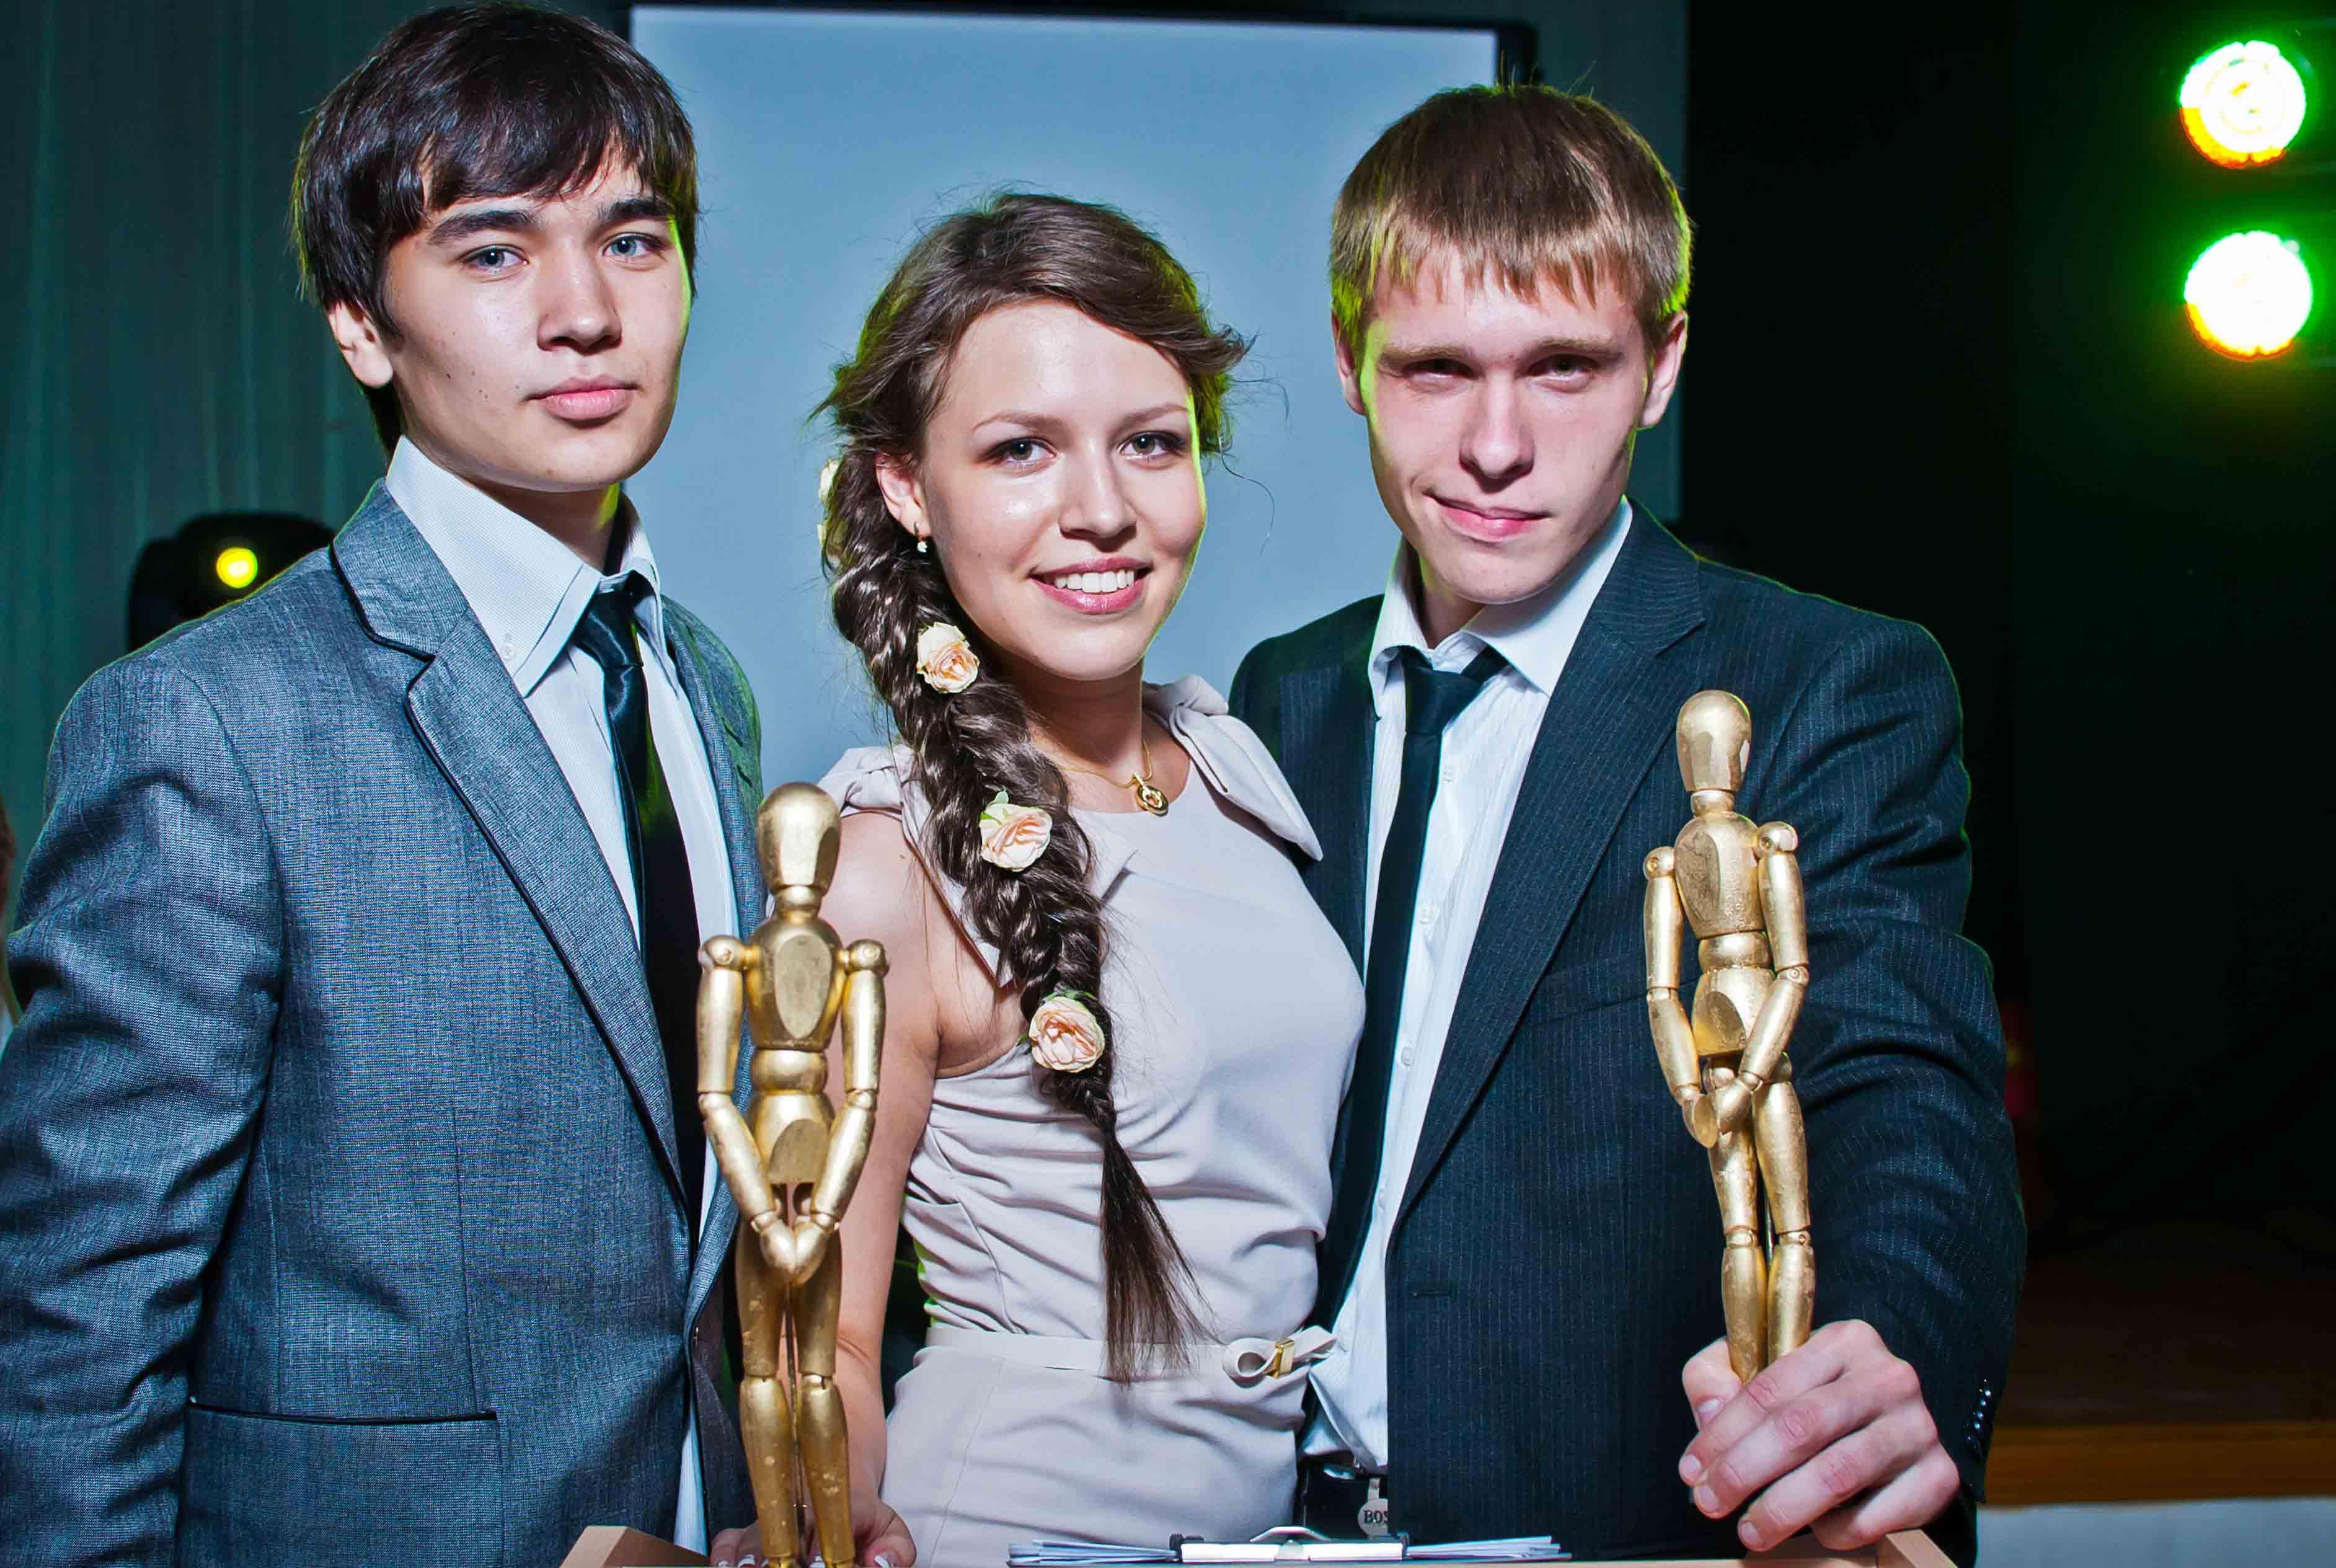 http://party-r.ru/images/upload/DSC_0546.jpg